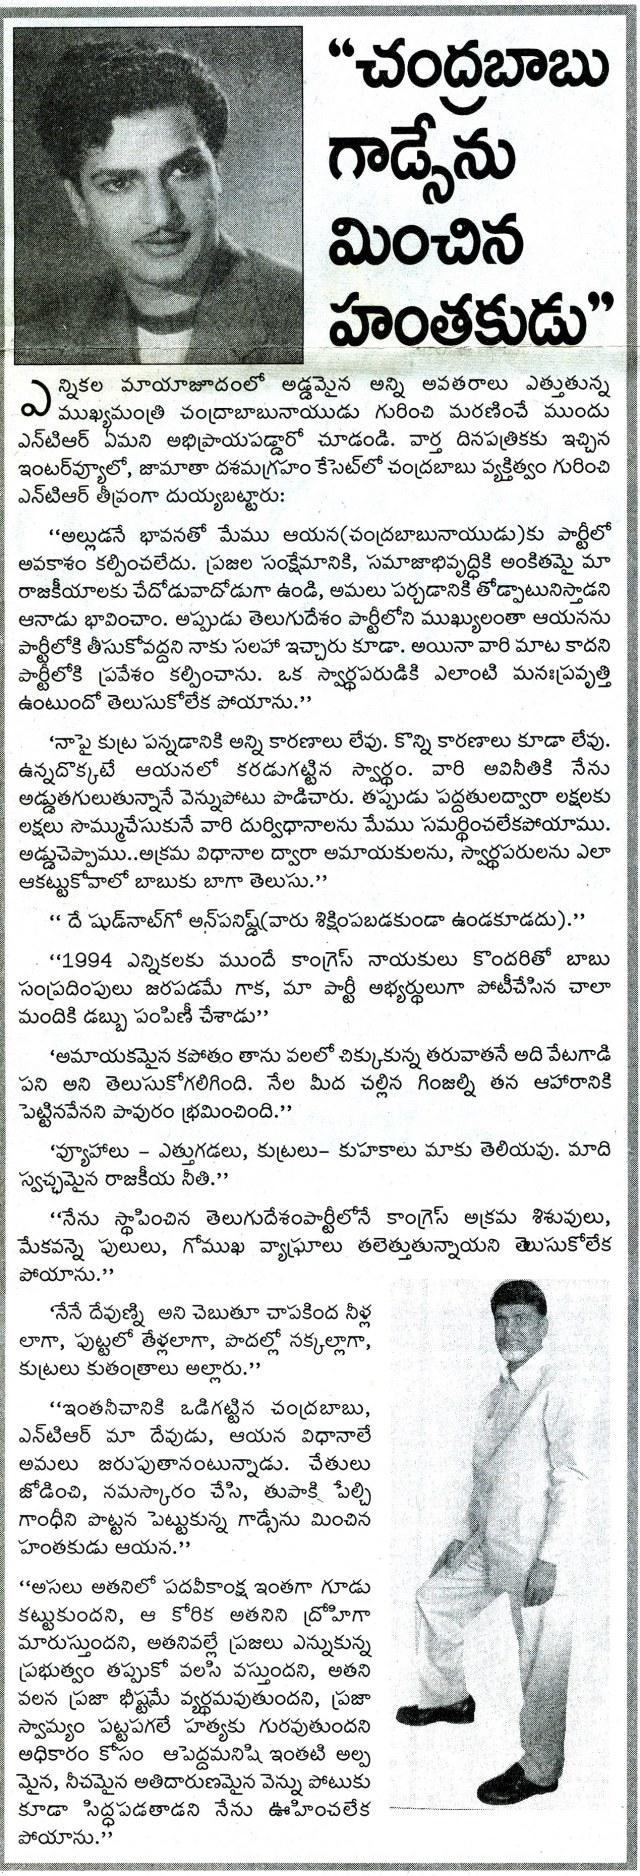 Chandrababu article1